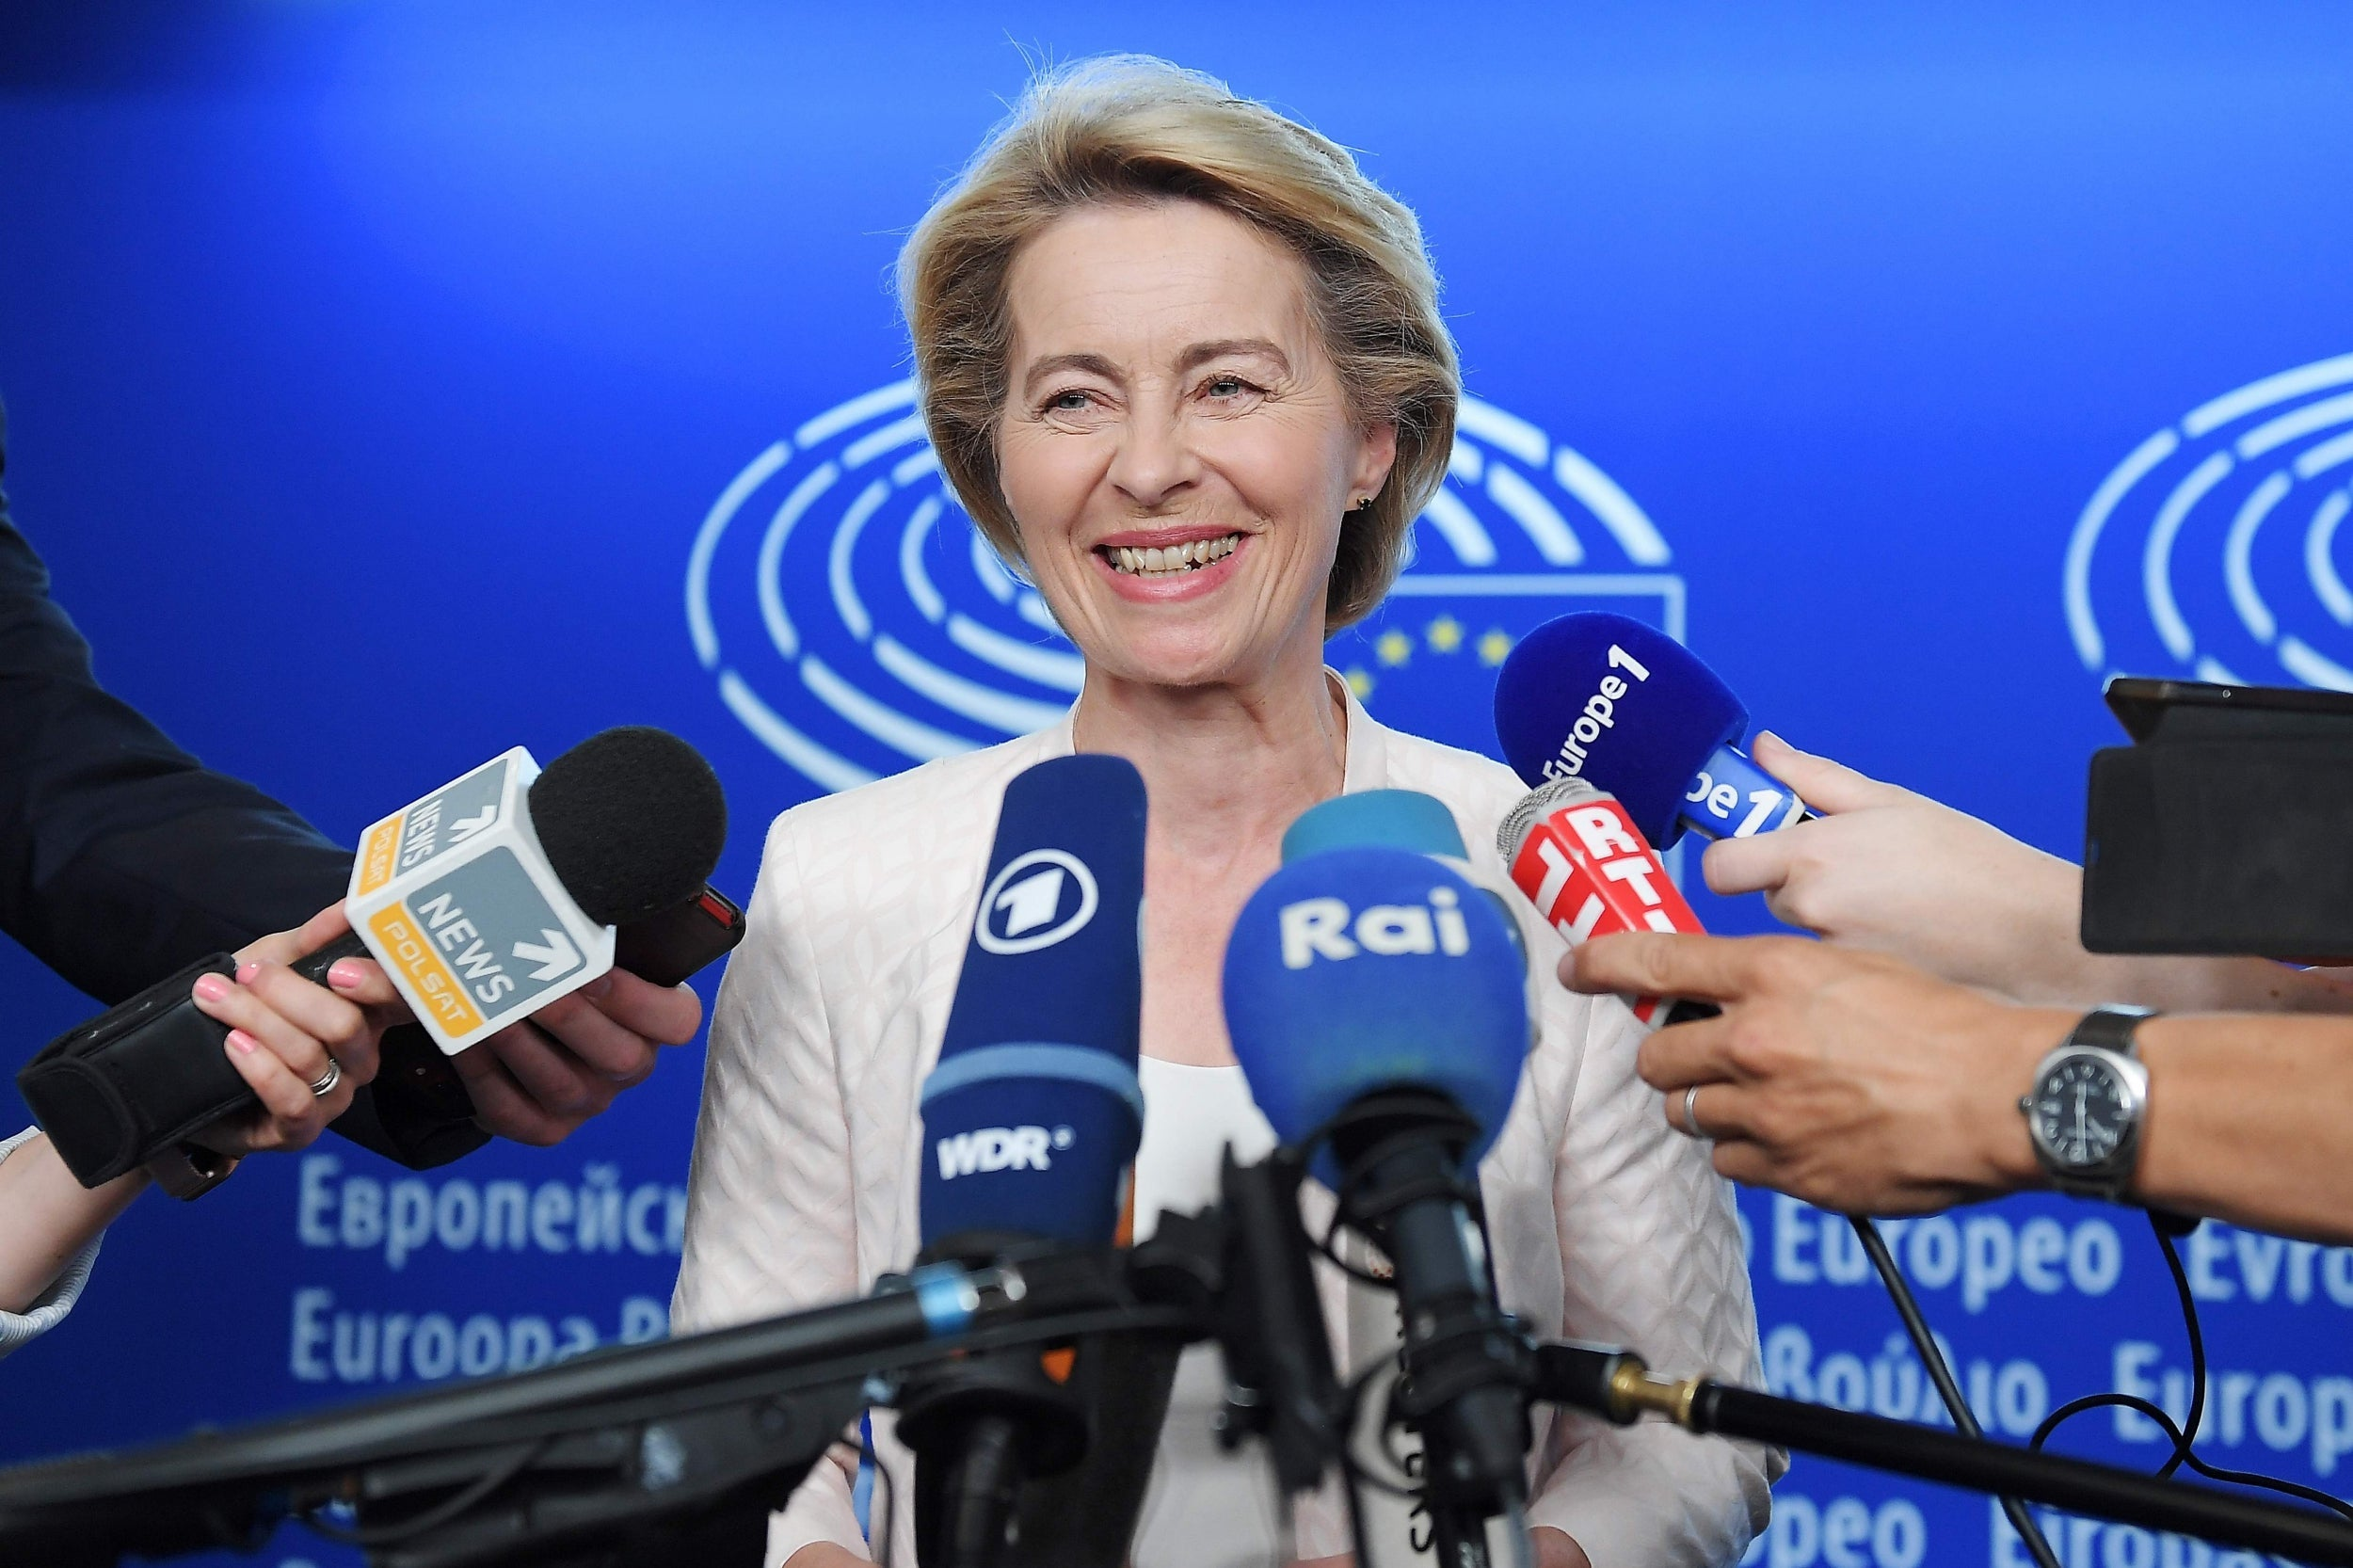 Ursula von der Leyen: the anti-Brexit German minister set to run the EU commission 2